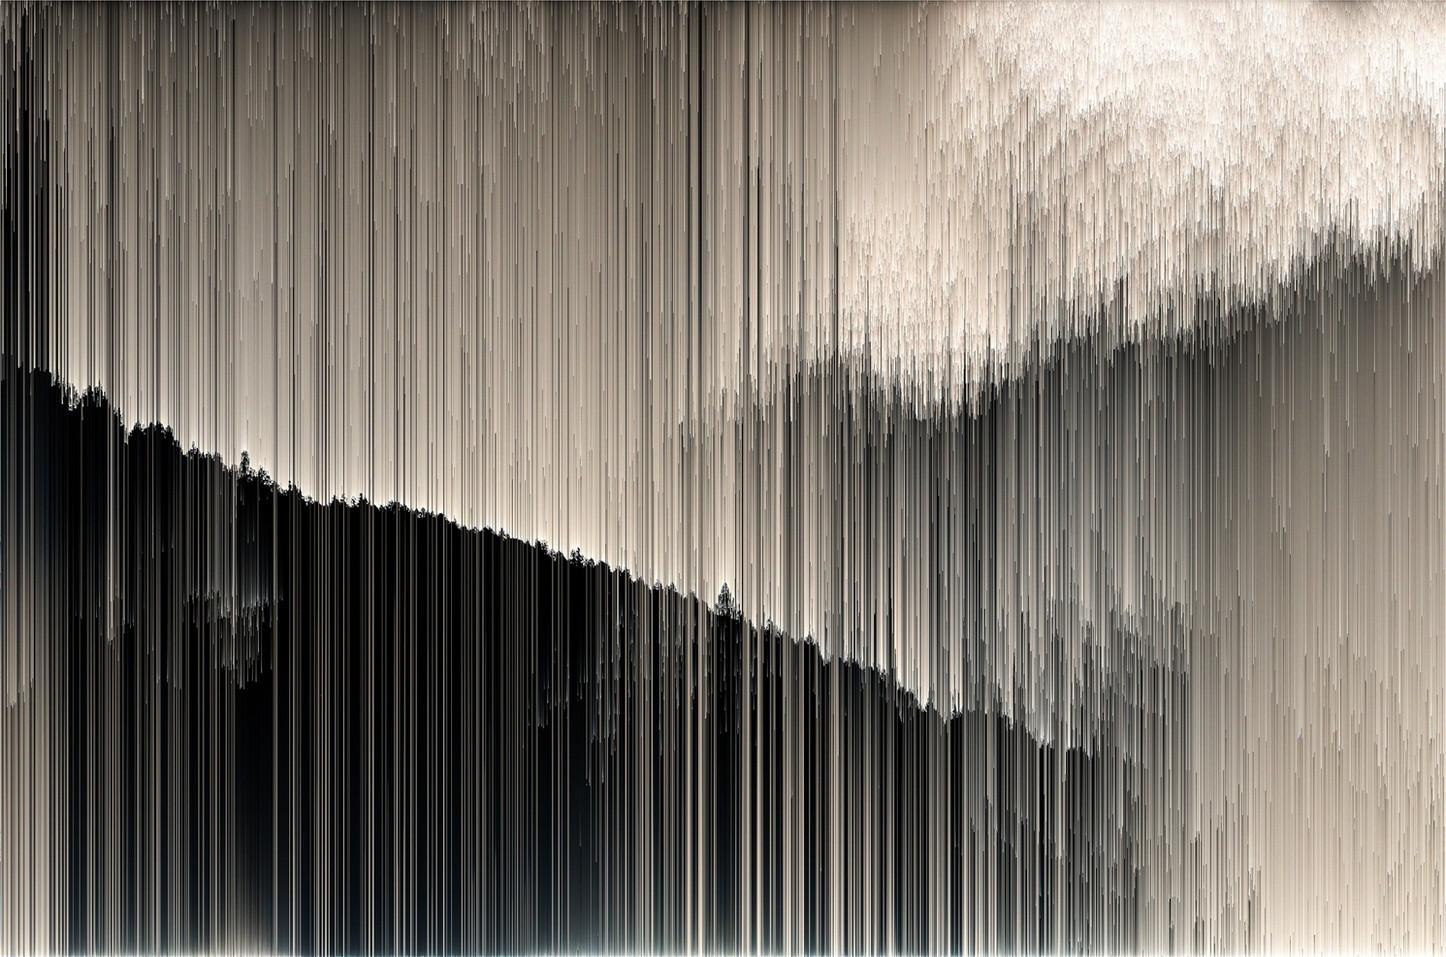 6749_edited.jpg